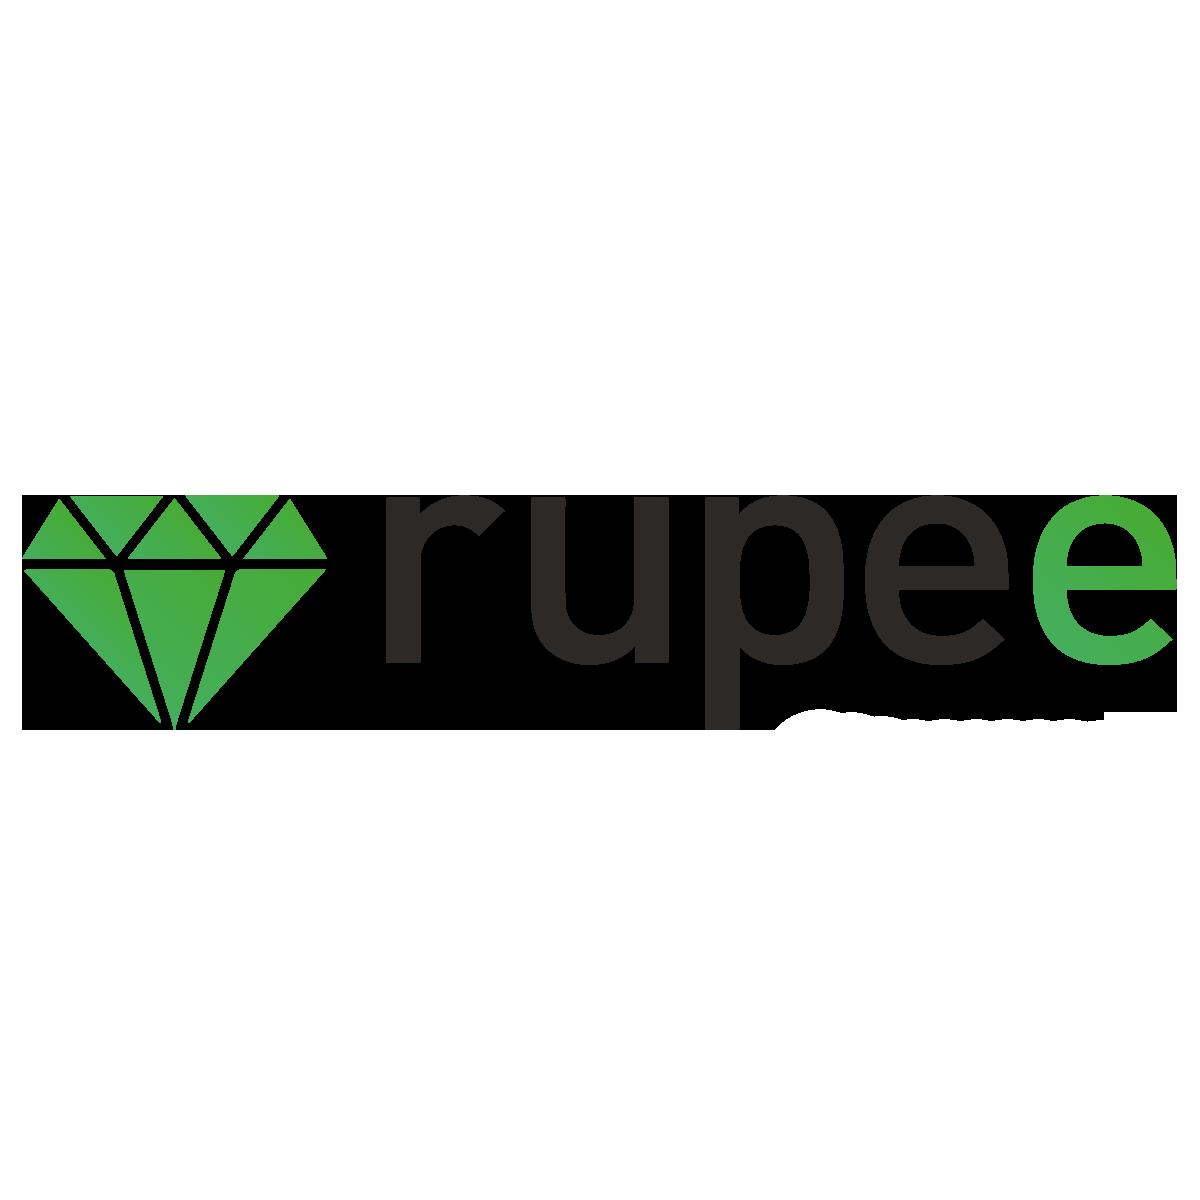 https://www.pro-manchester.co.uk/wp-content/uploads/2021/06/Rupee-logo.png